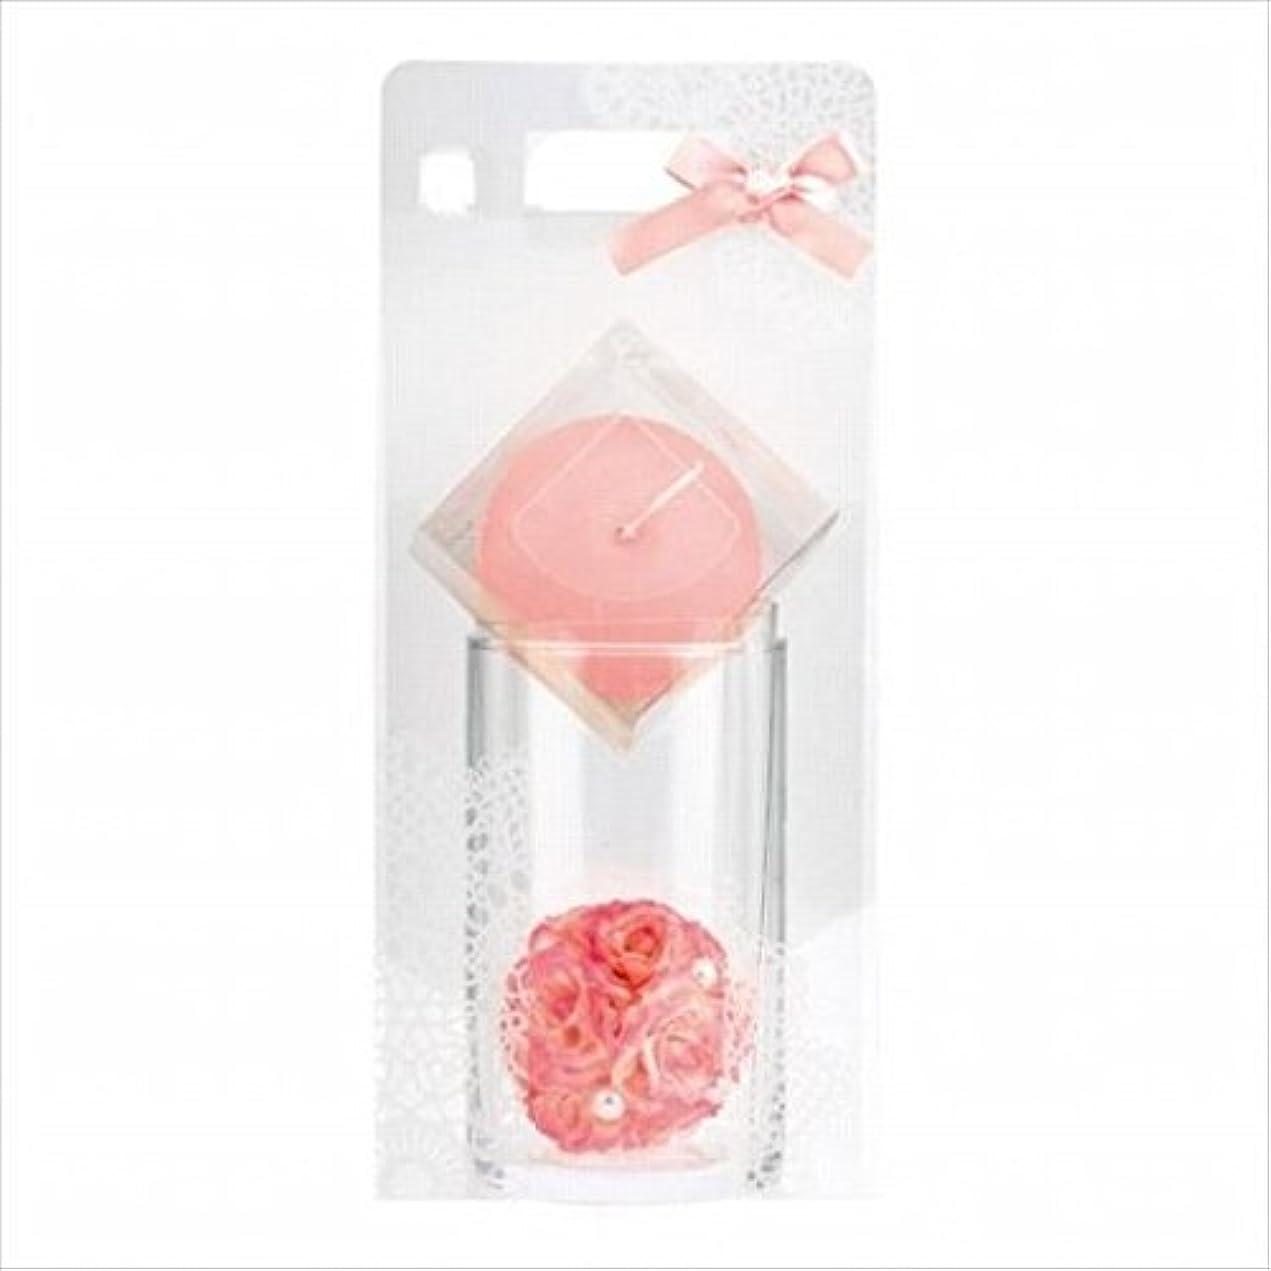 kameyama candle(カメヤマキャンドル) ローズボールセット 「 ピーチアンバ 」 キャンドル ギフトセット(66031000PA)